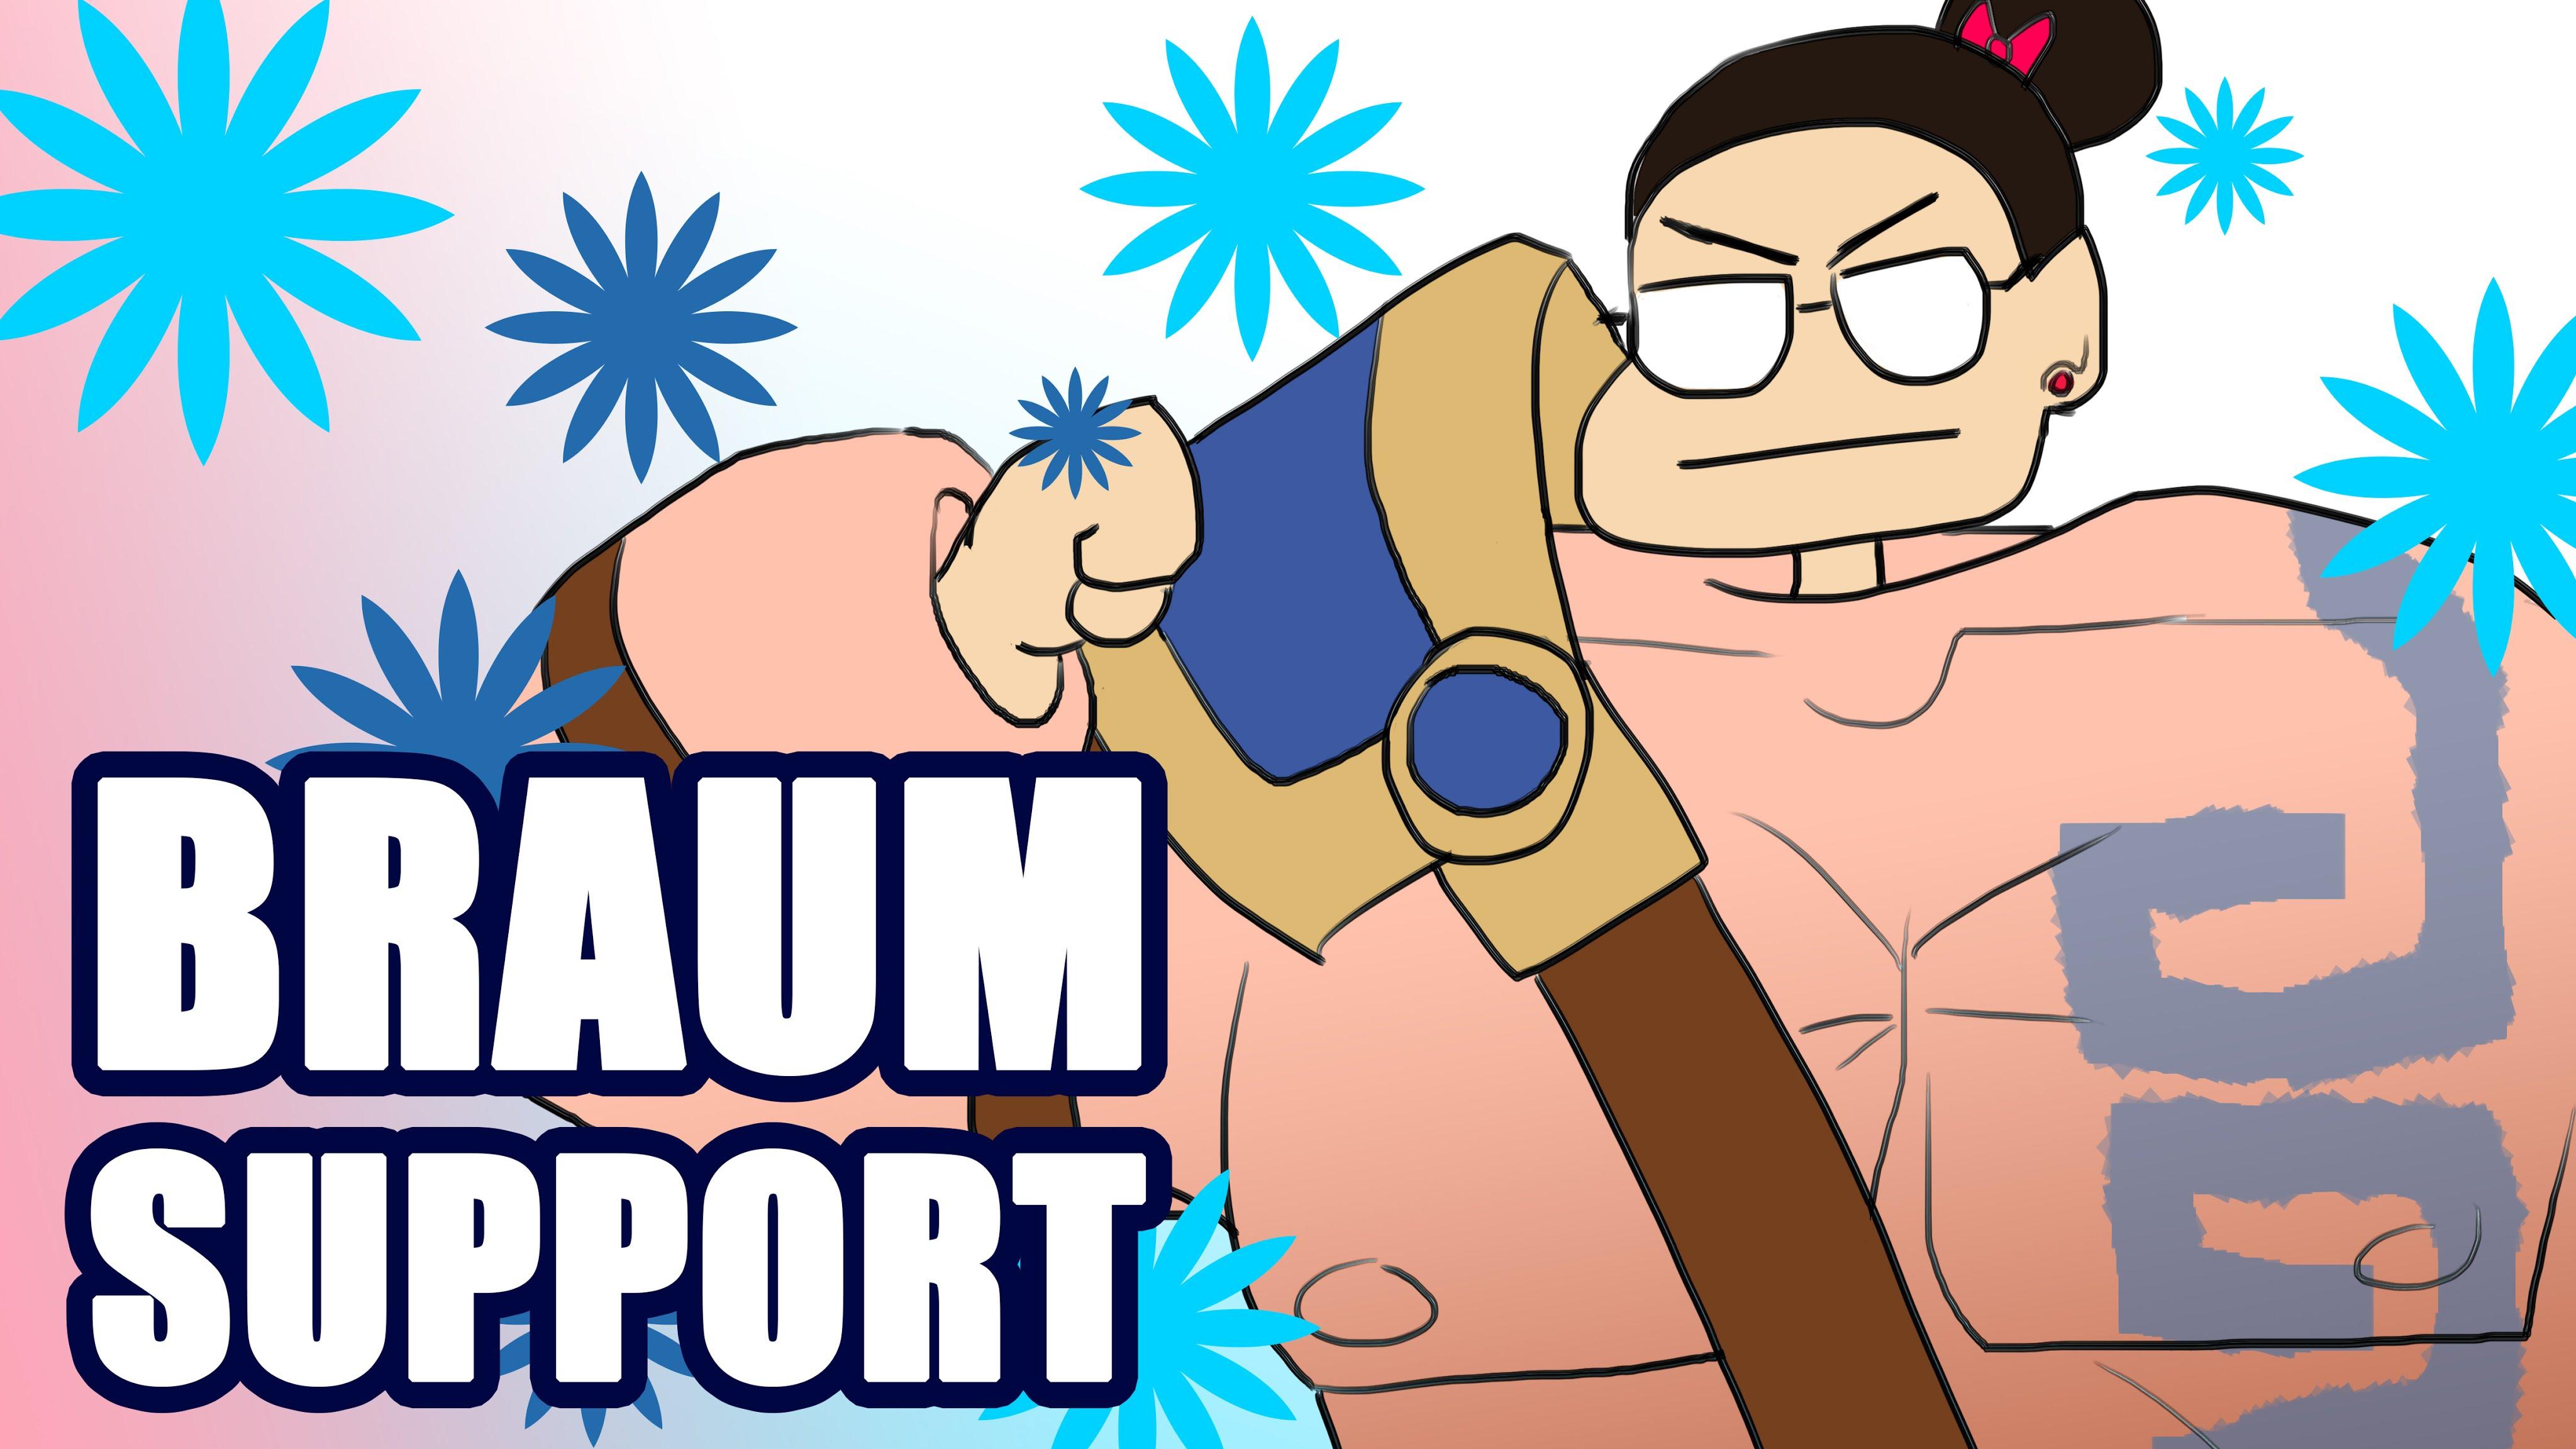 S+ Braum Support: Jinx gets FAT.